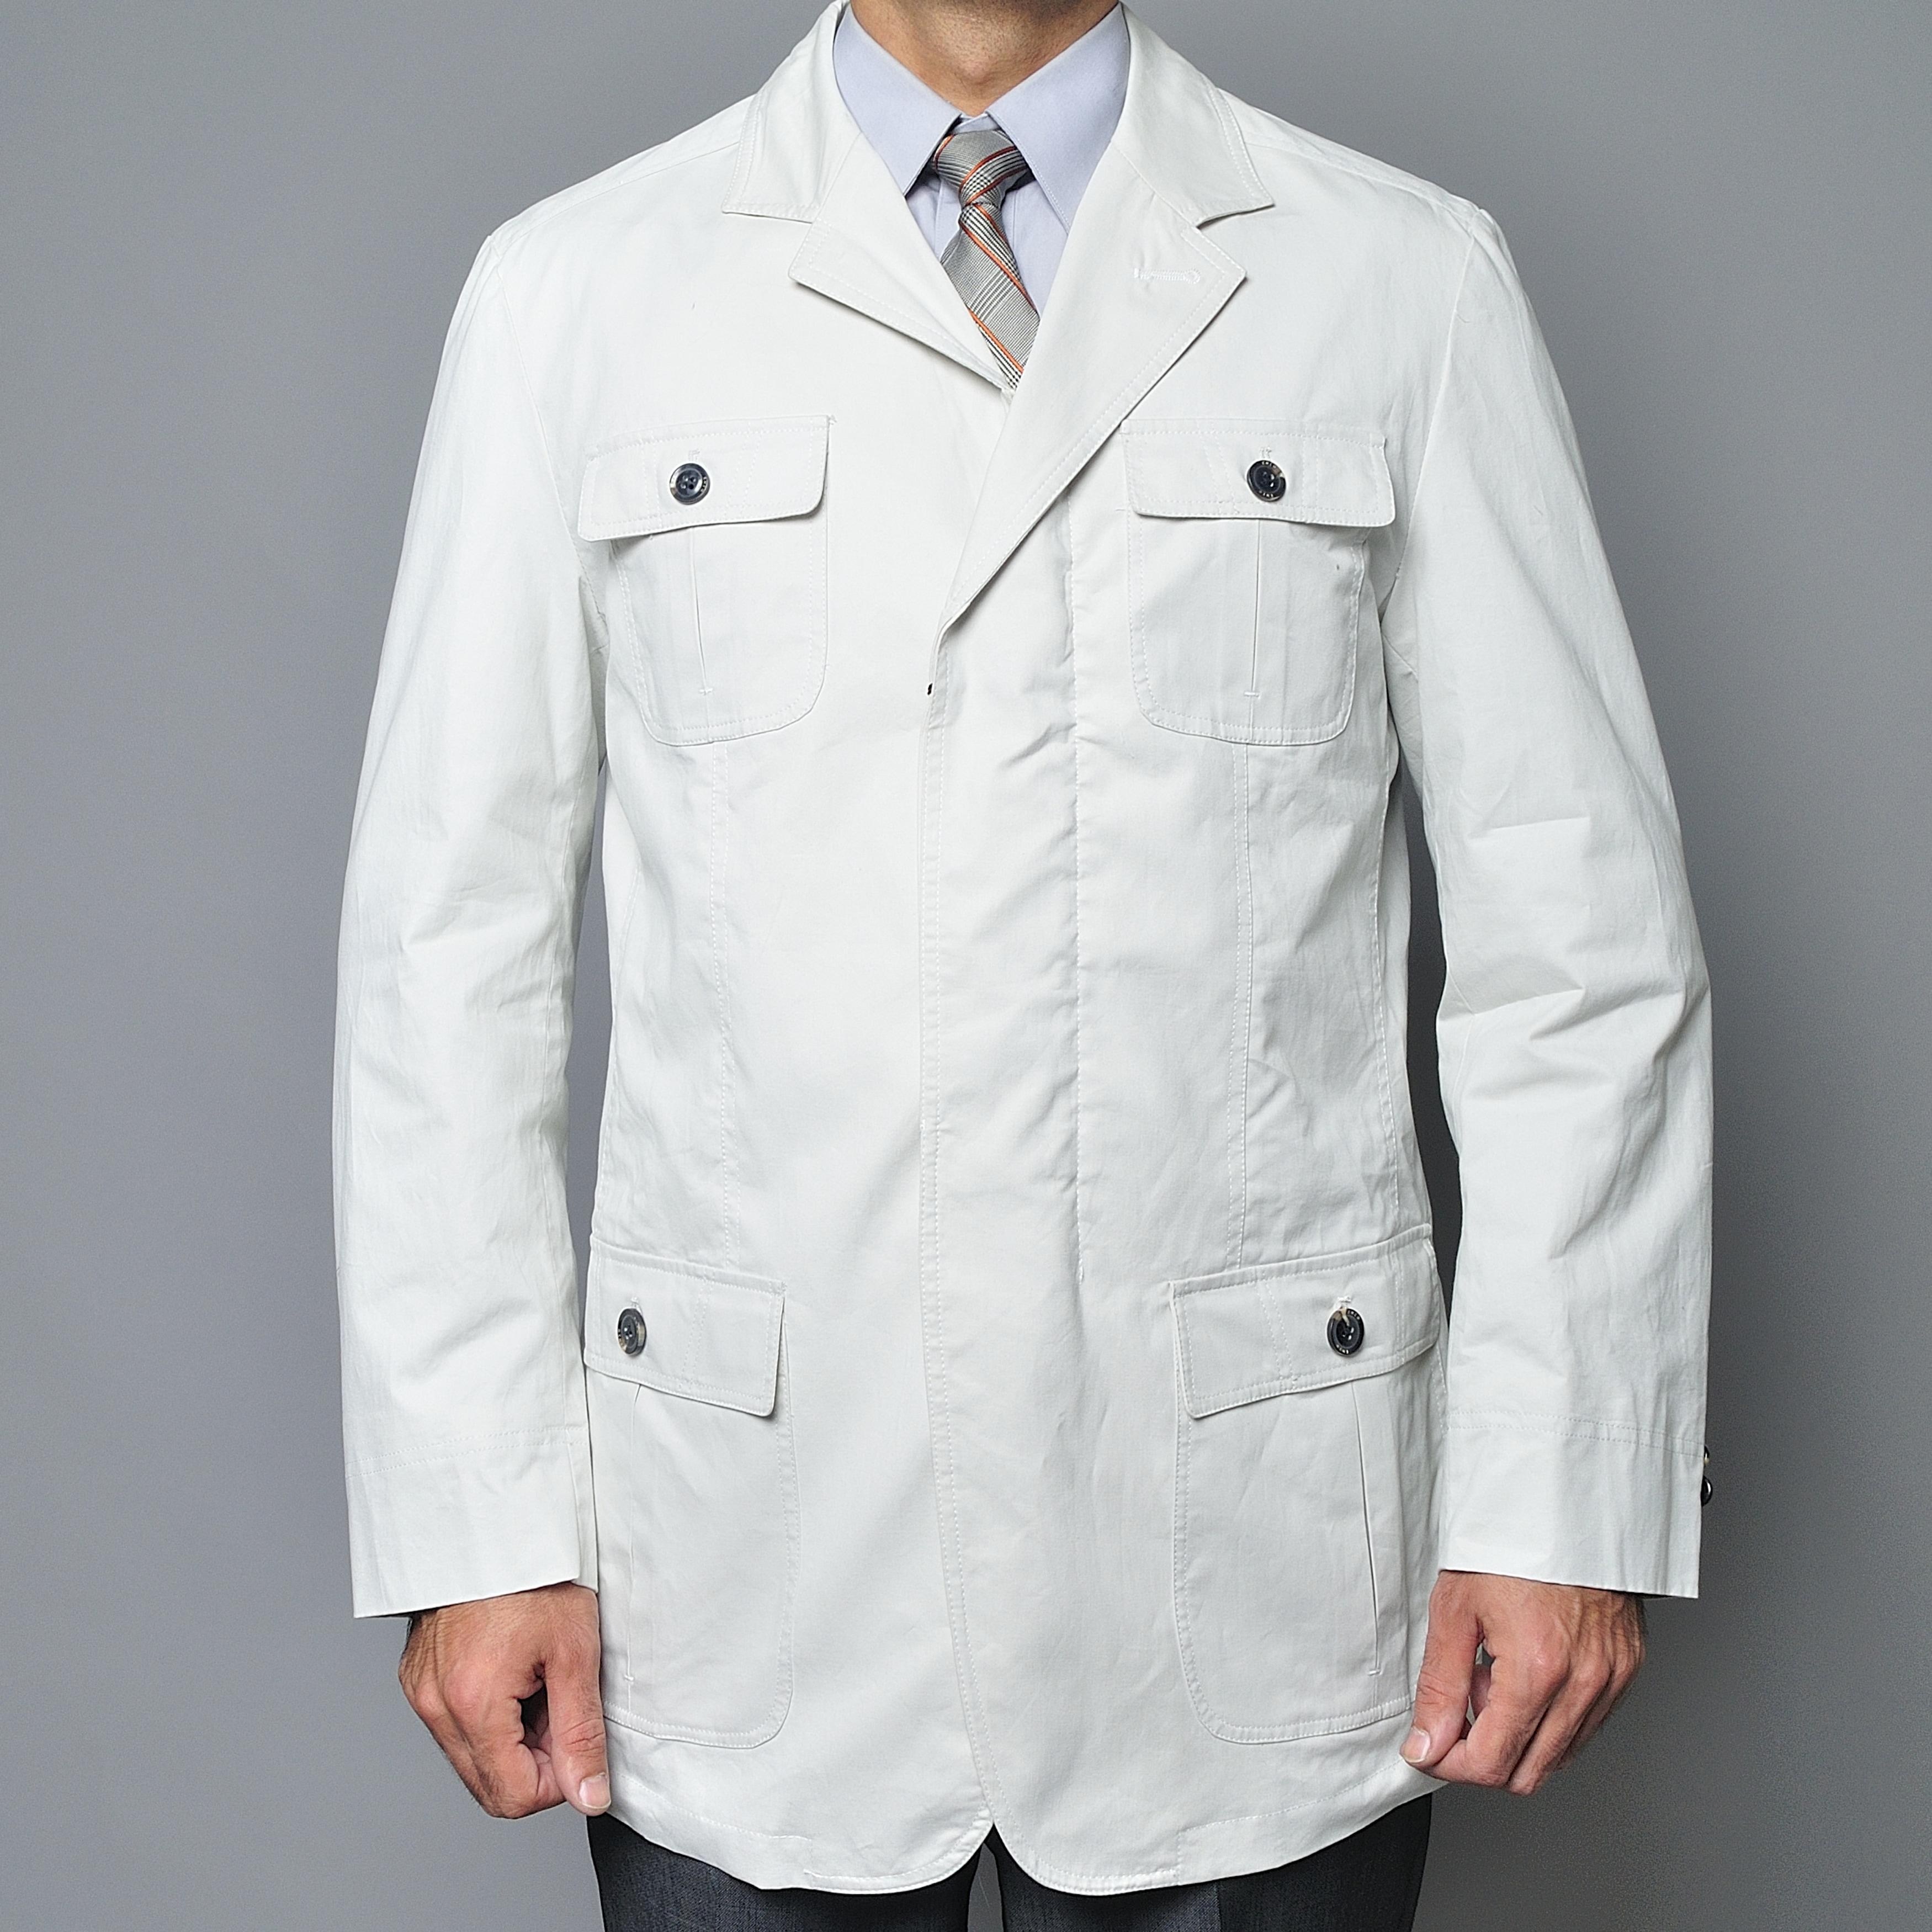 Men's Bone Cotton Jacket